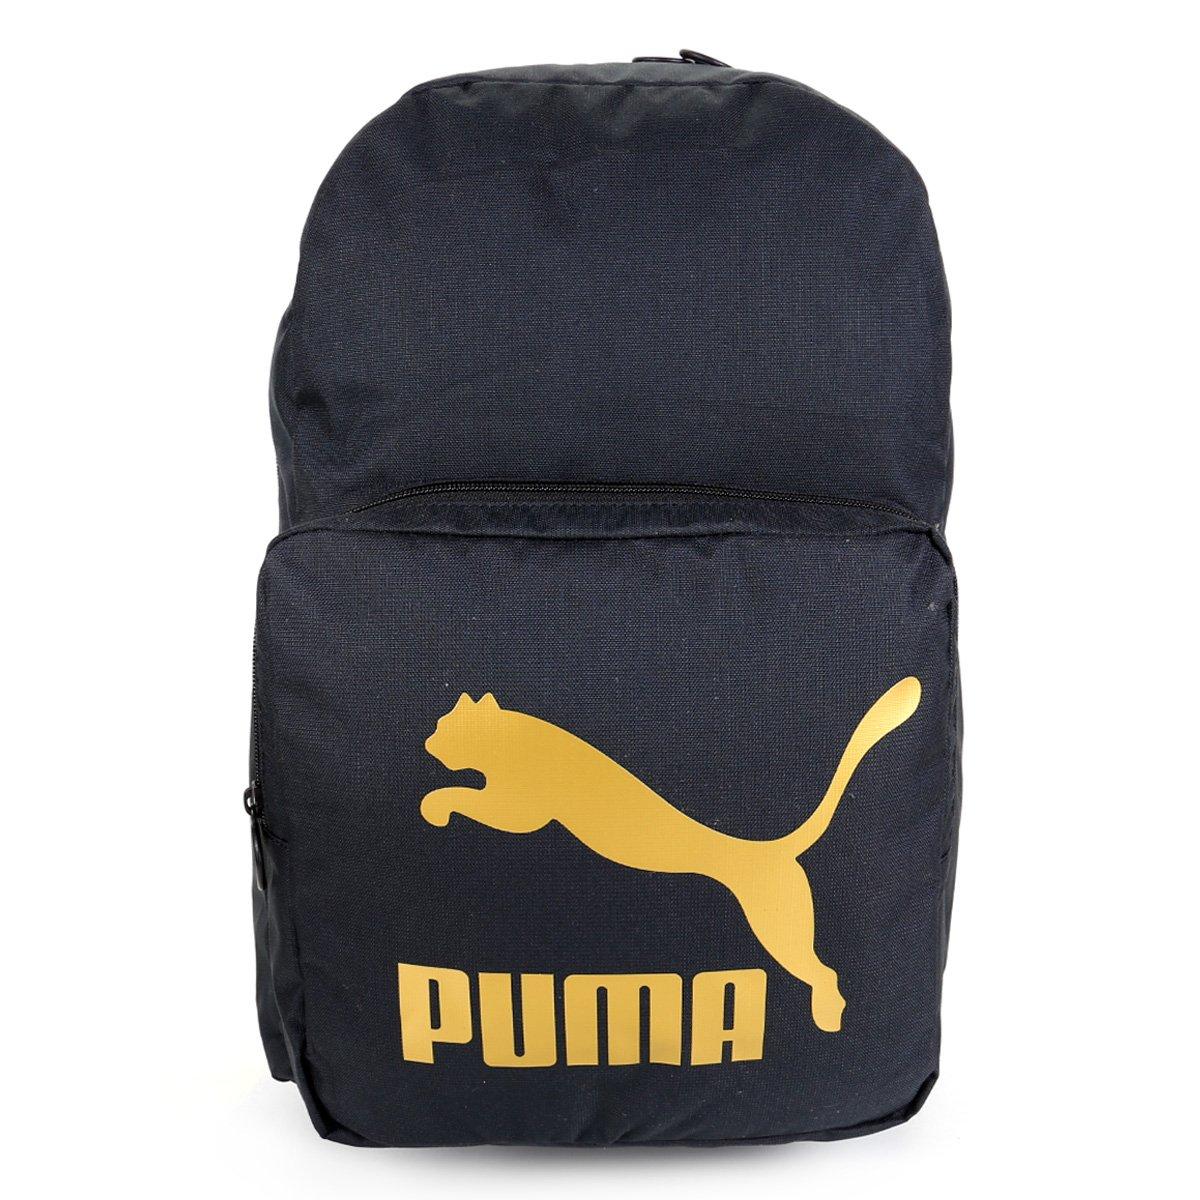 Mochila Puma Originals Urban